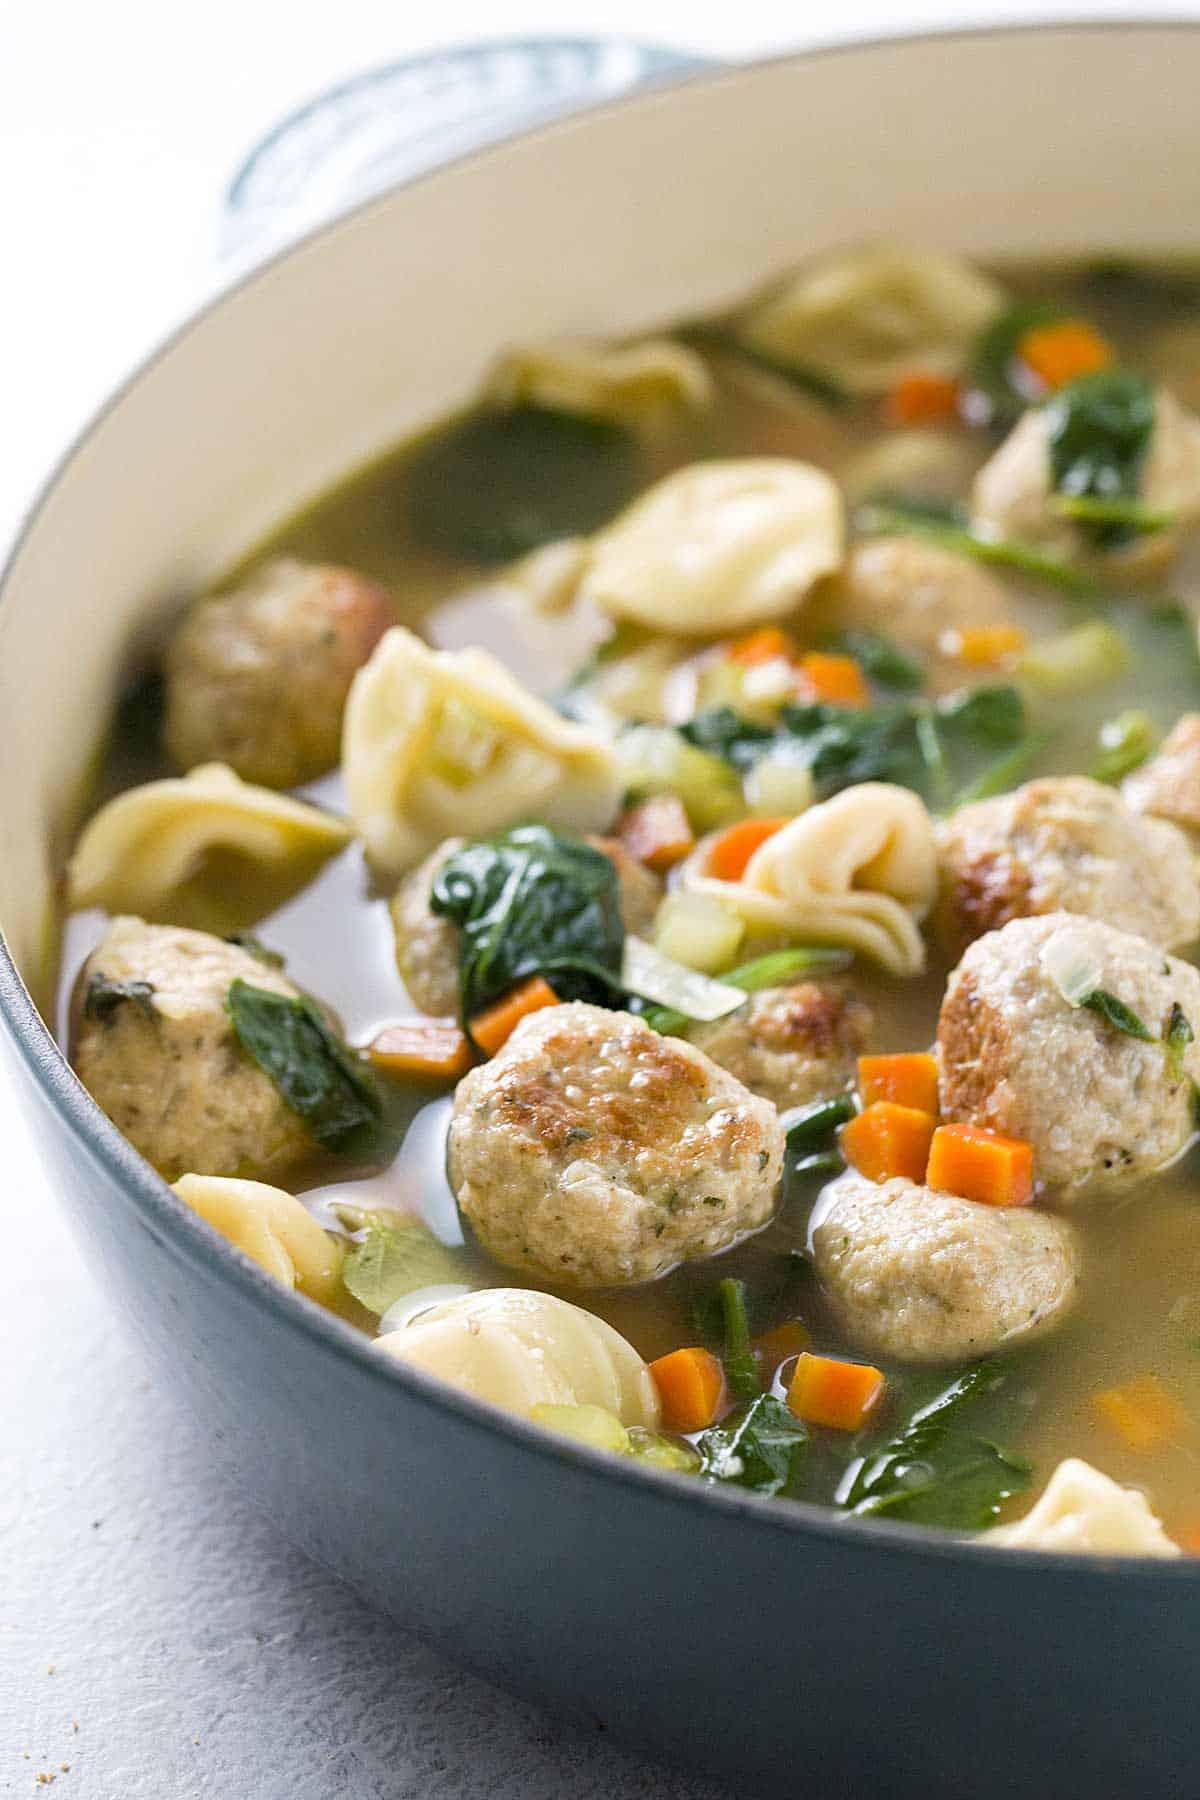 Italian Wedding Soup With Chicken  Italian Wedding Soup with Turkey Meatballs and Tortellini